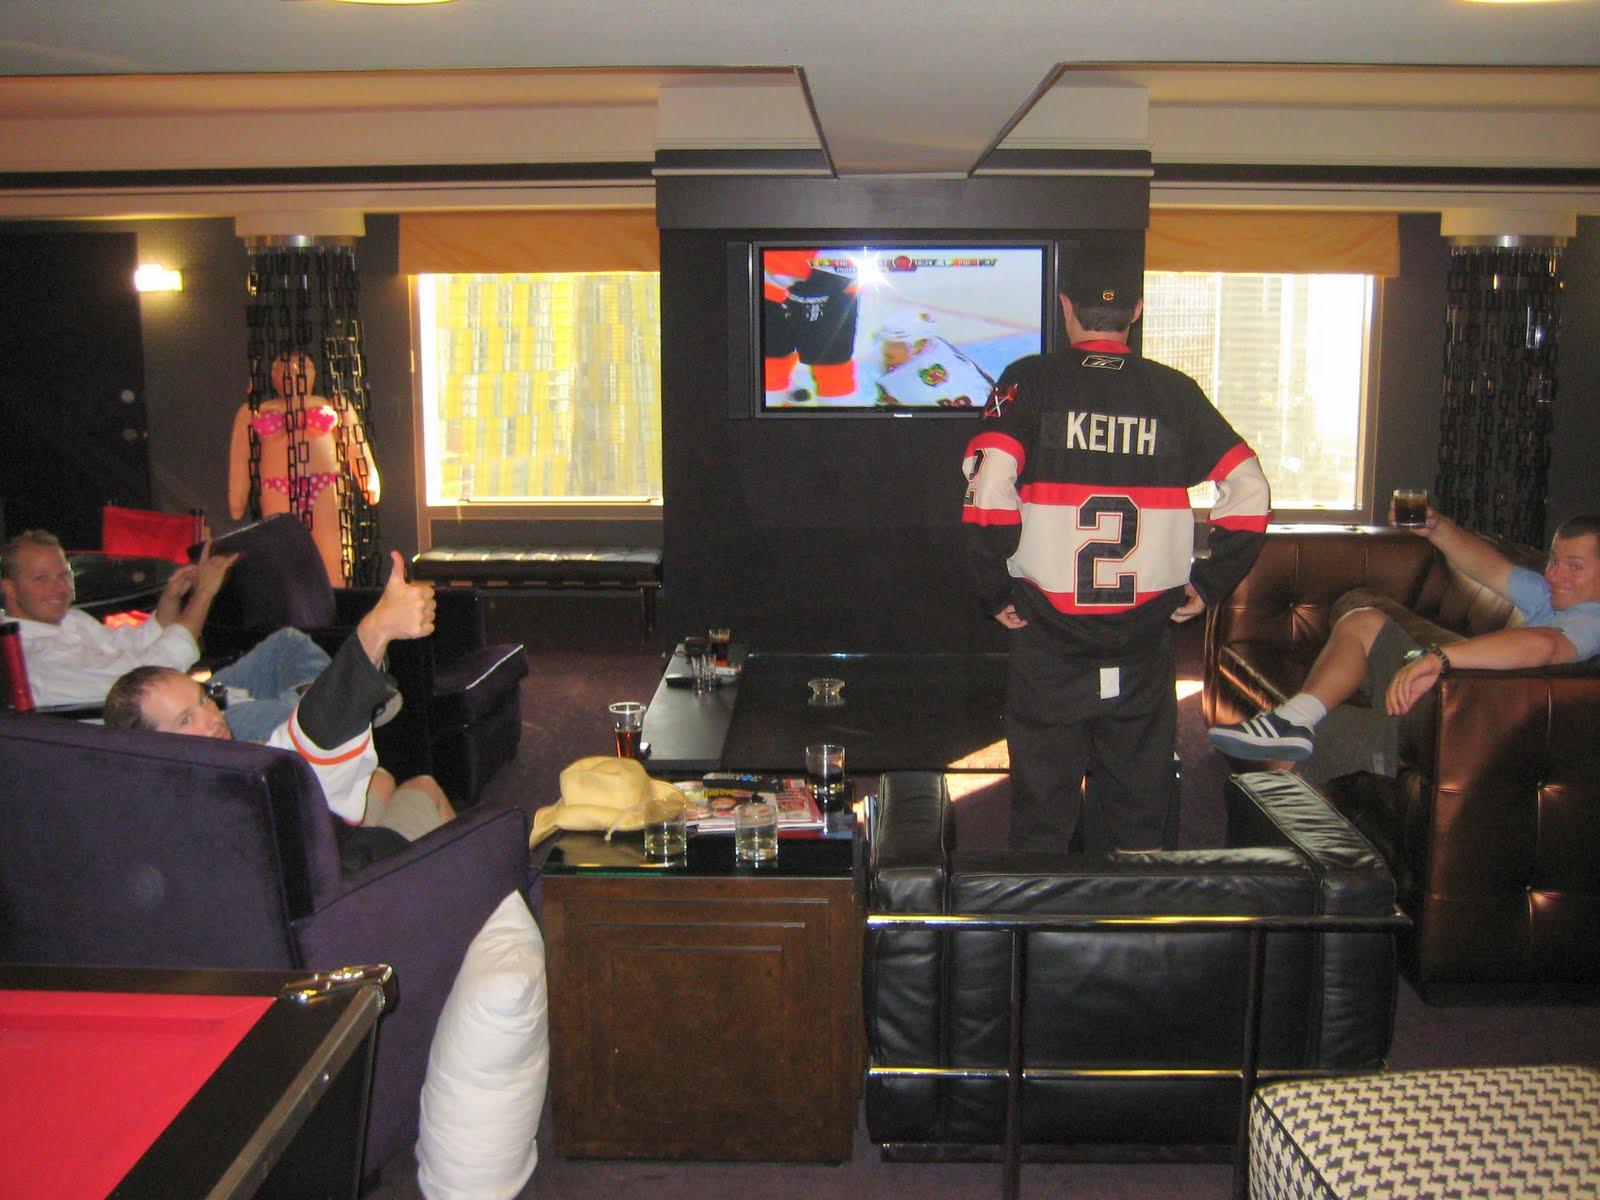 3 Bedroom Suites Las Vegas ~ sicuba.us